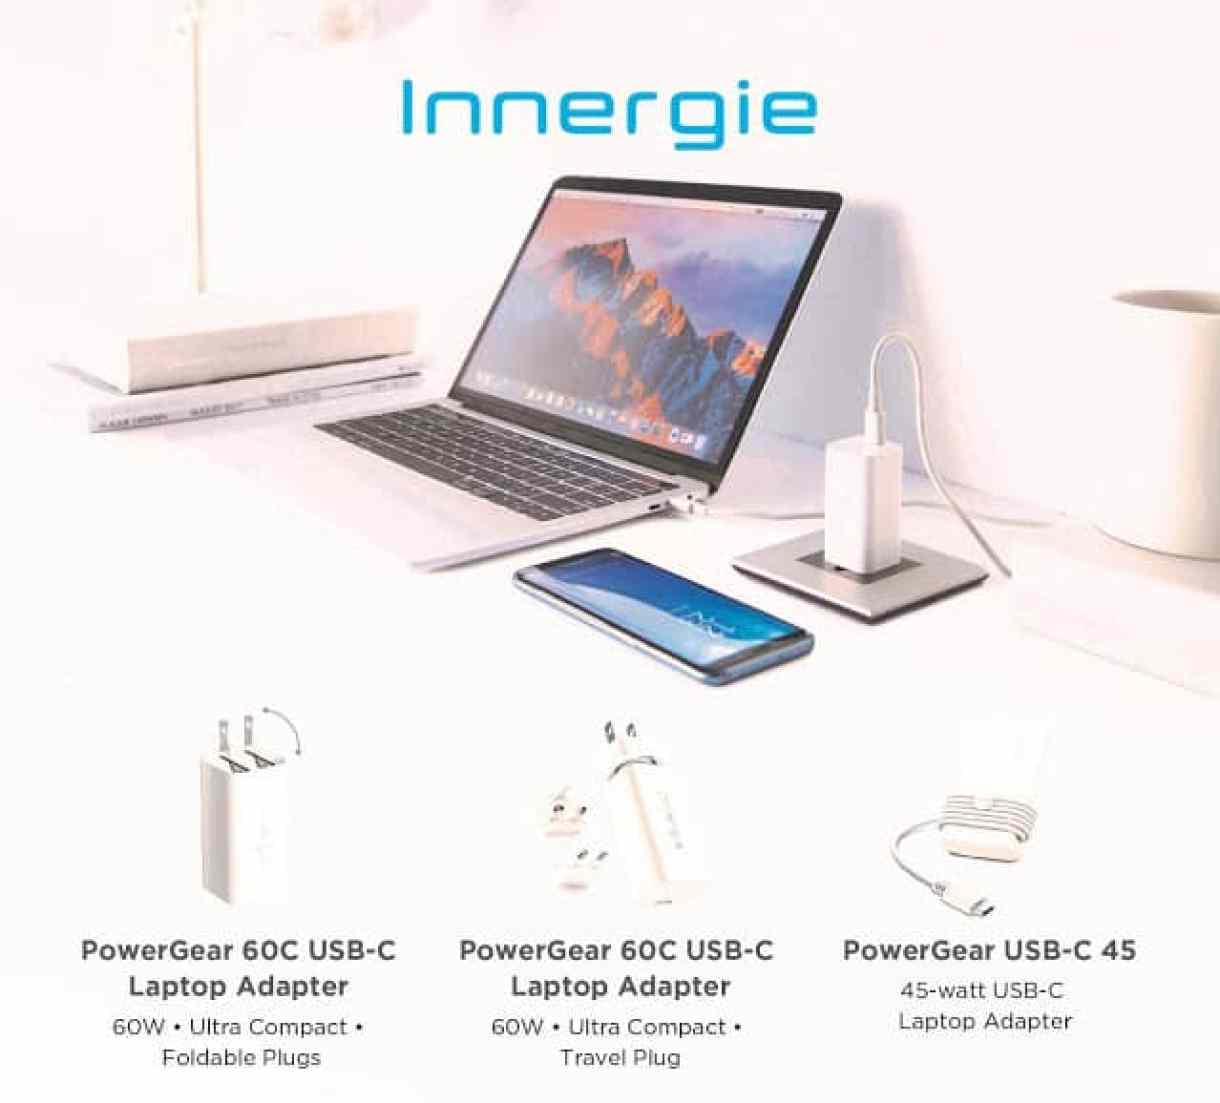 - Innergie อะแดปเตอร์ USB-C สำหรับแล็ปท็อป รุ่น PowerGear 60C ที่งาน SiS Hatyai Showcase 2018